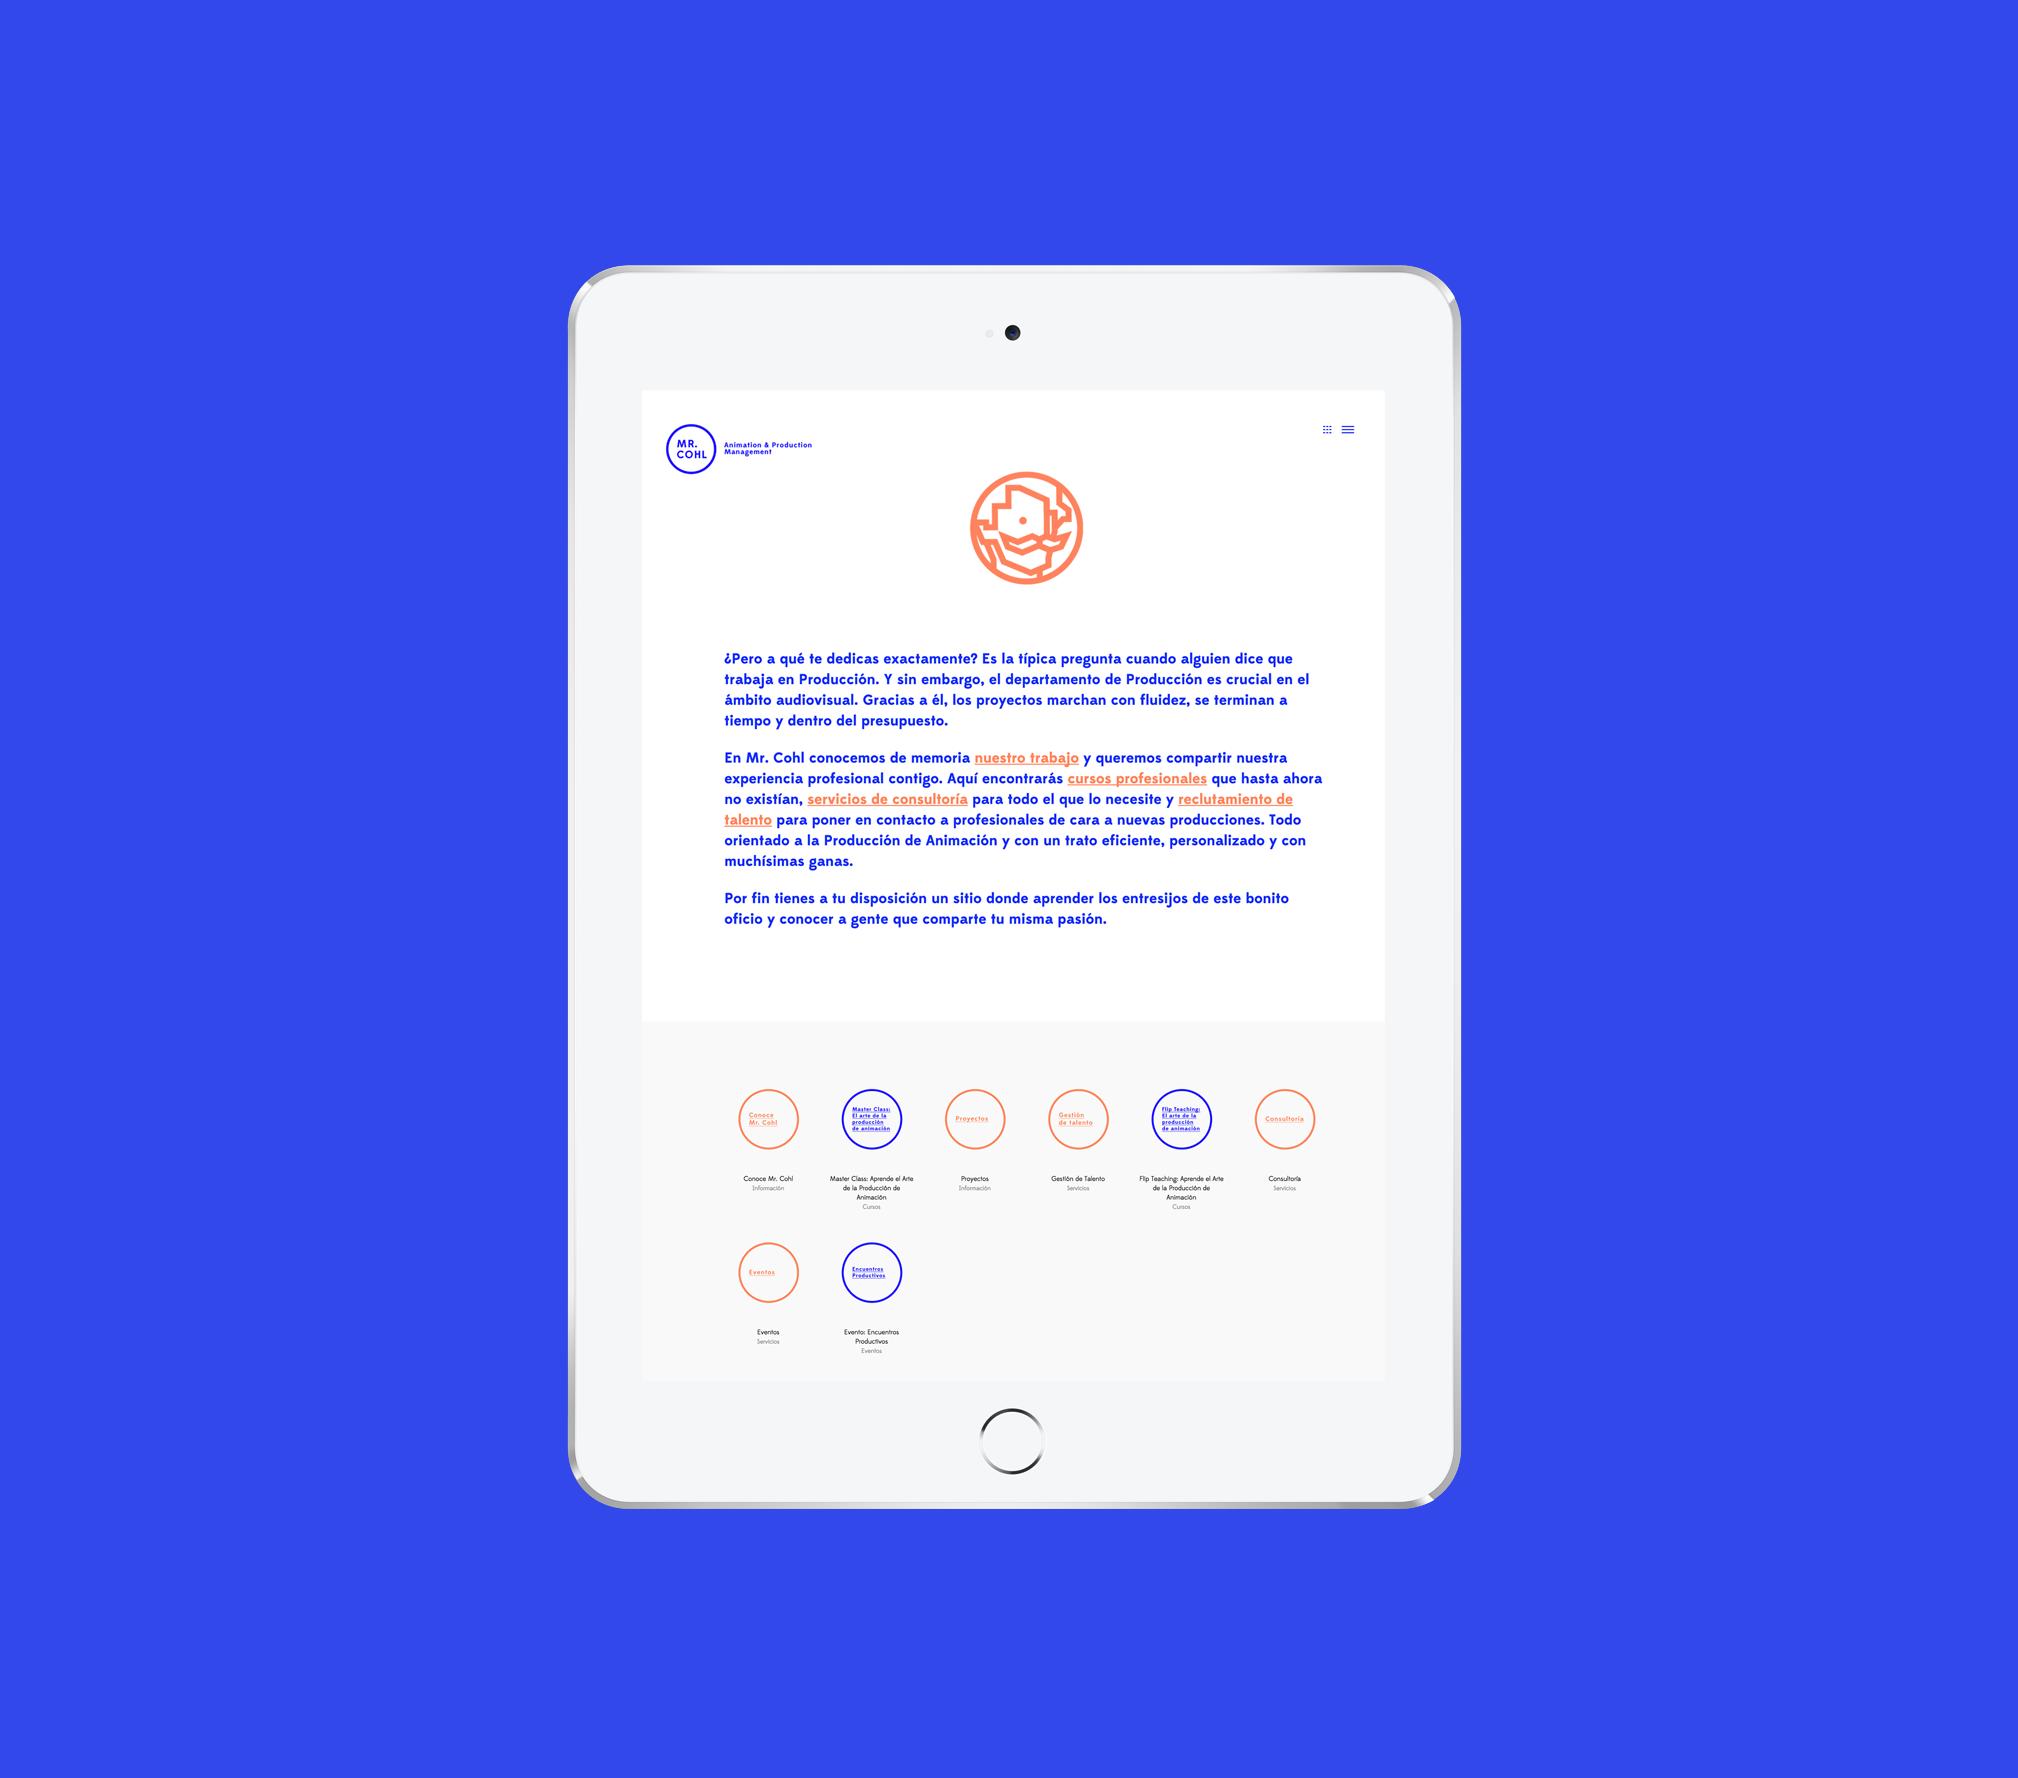 Mr. Cohl, Proyecto de Branding & Web Design por The Woork Co